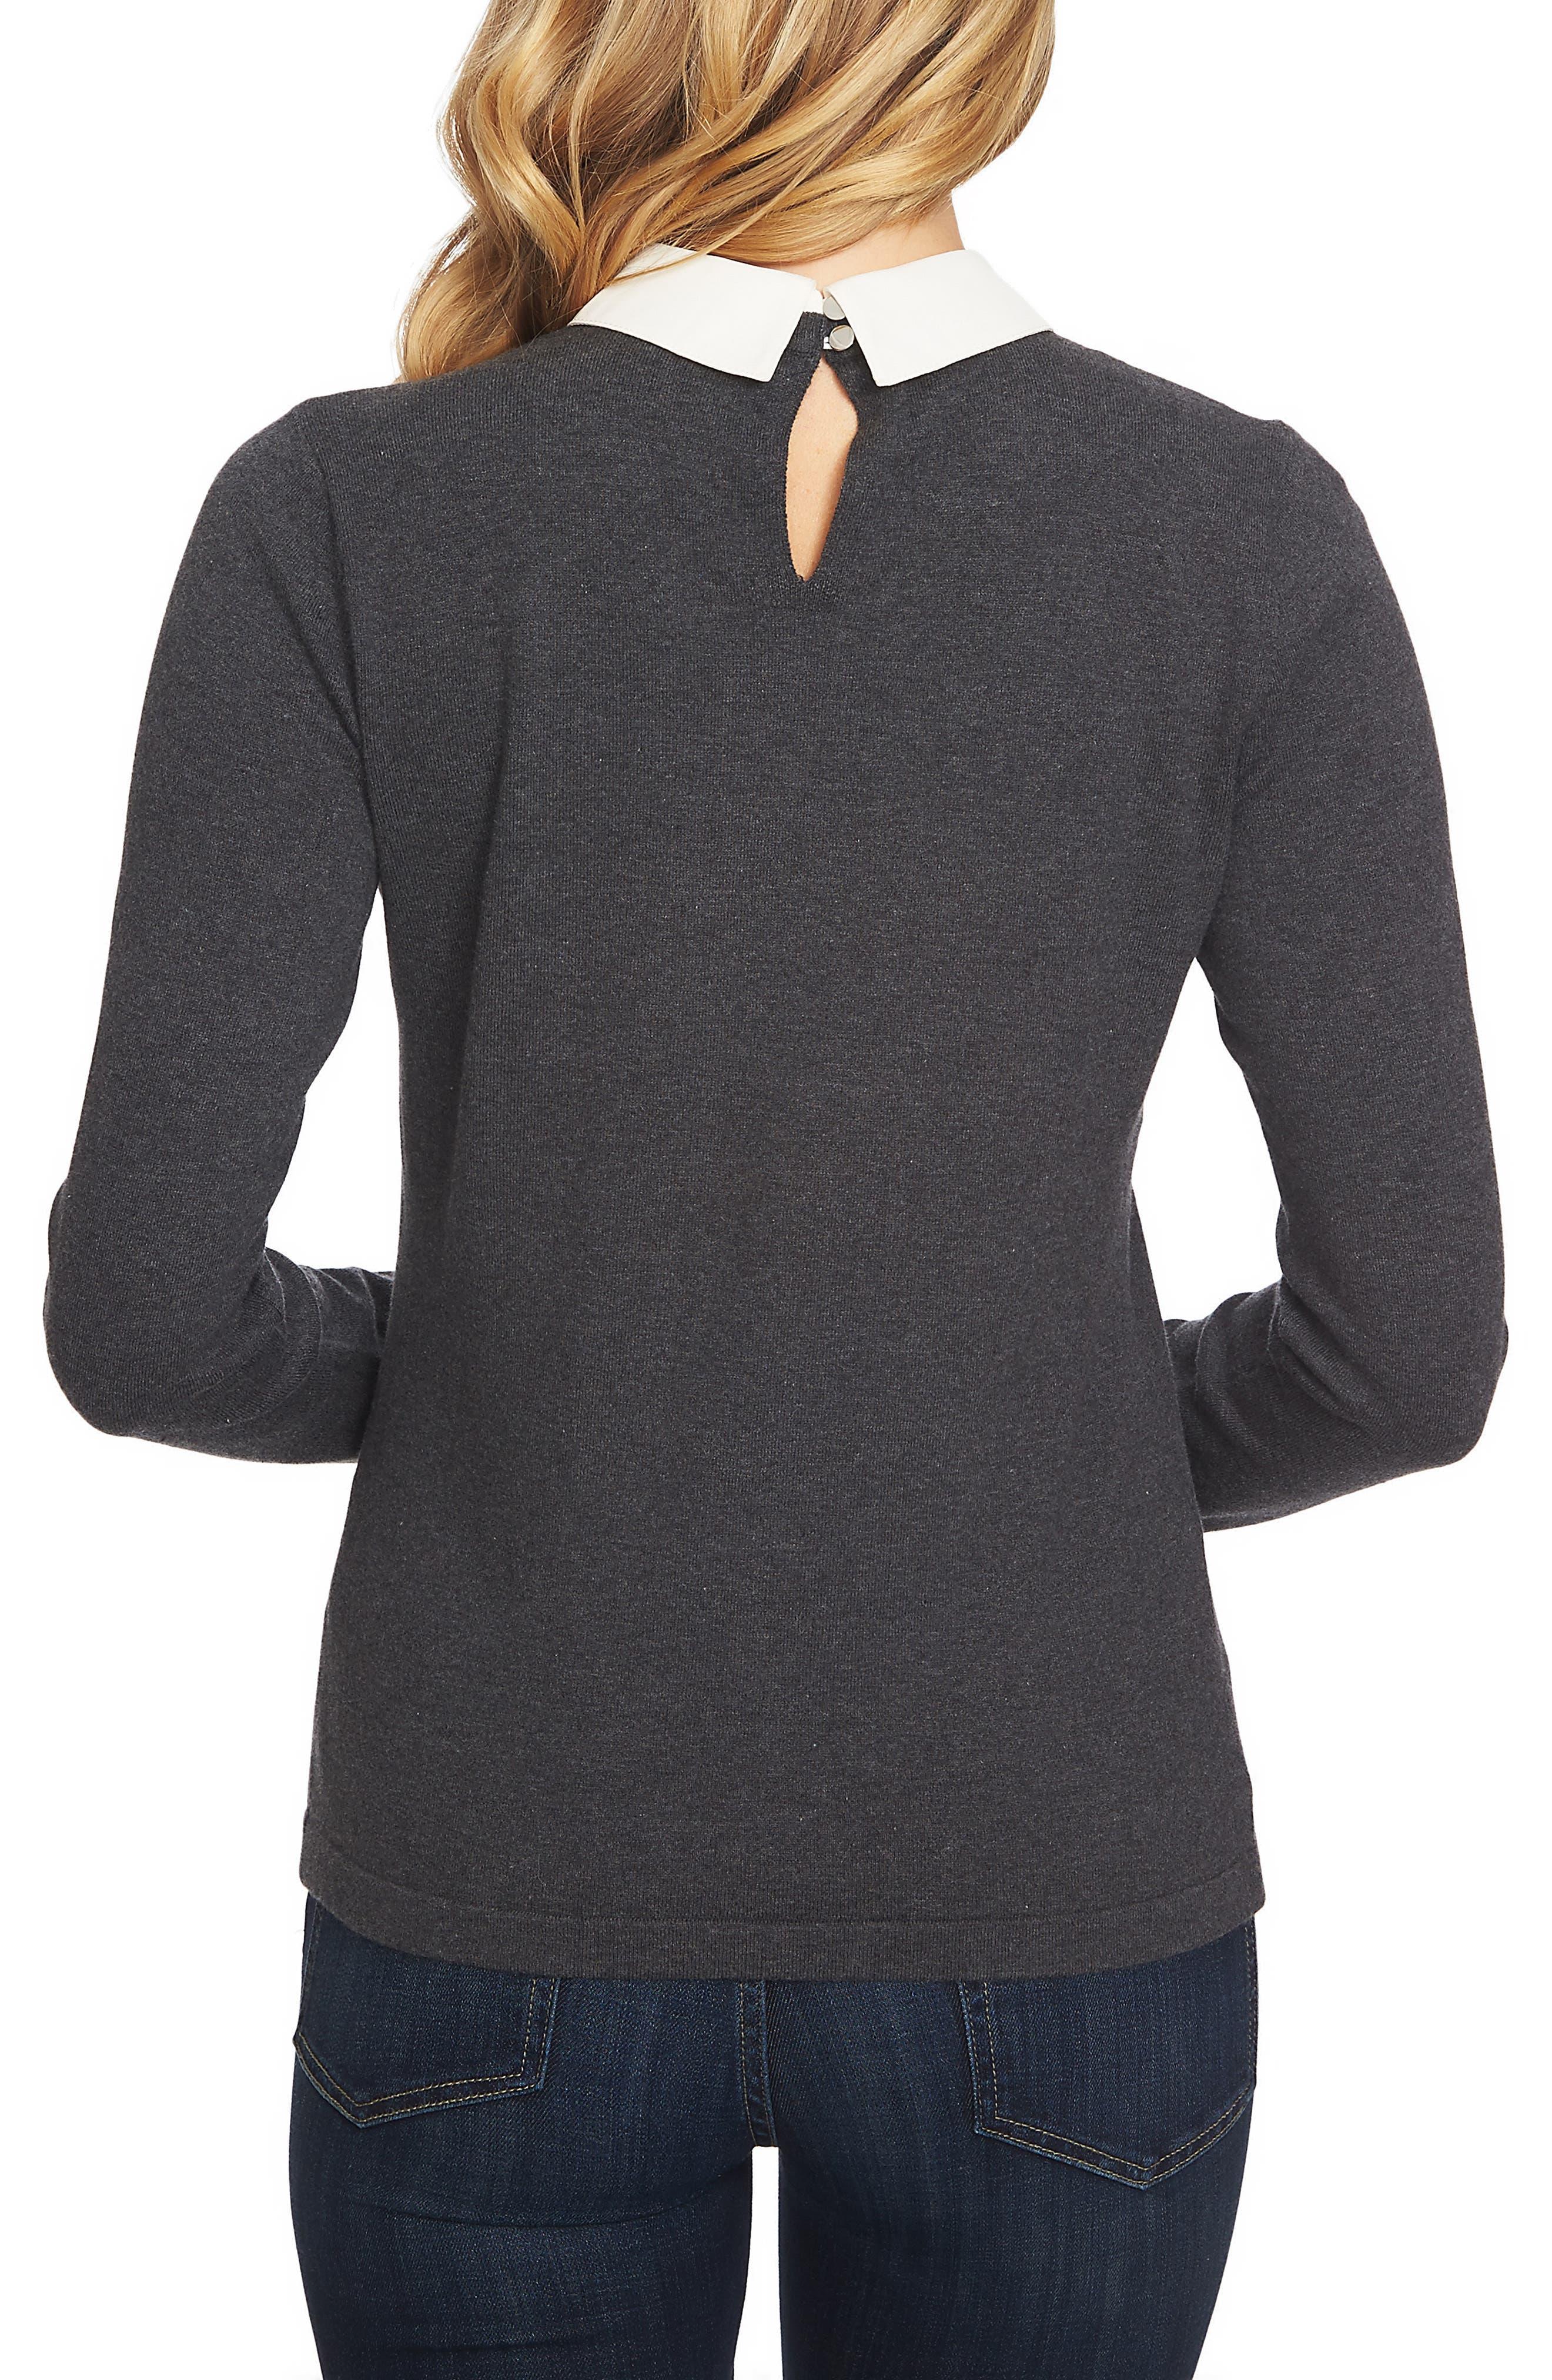 Embellished Collar Cotton Blend Sweater,                             Alternate thumbnail 2, color,                             020